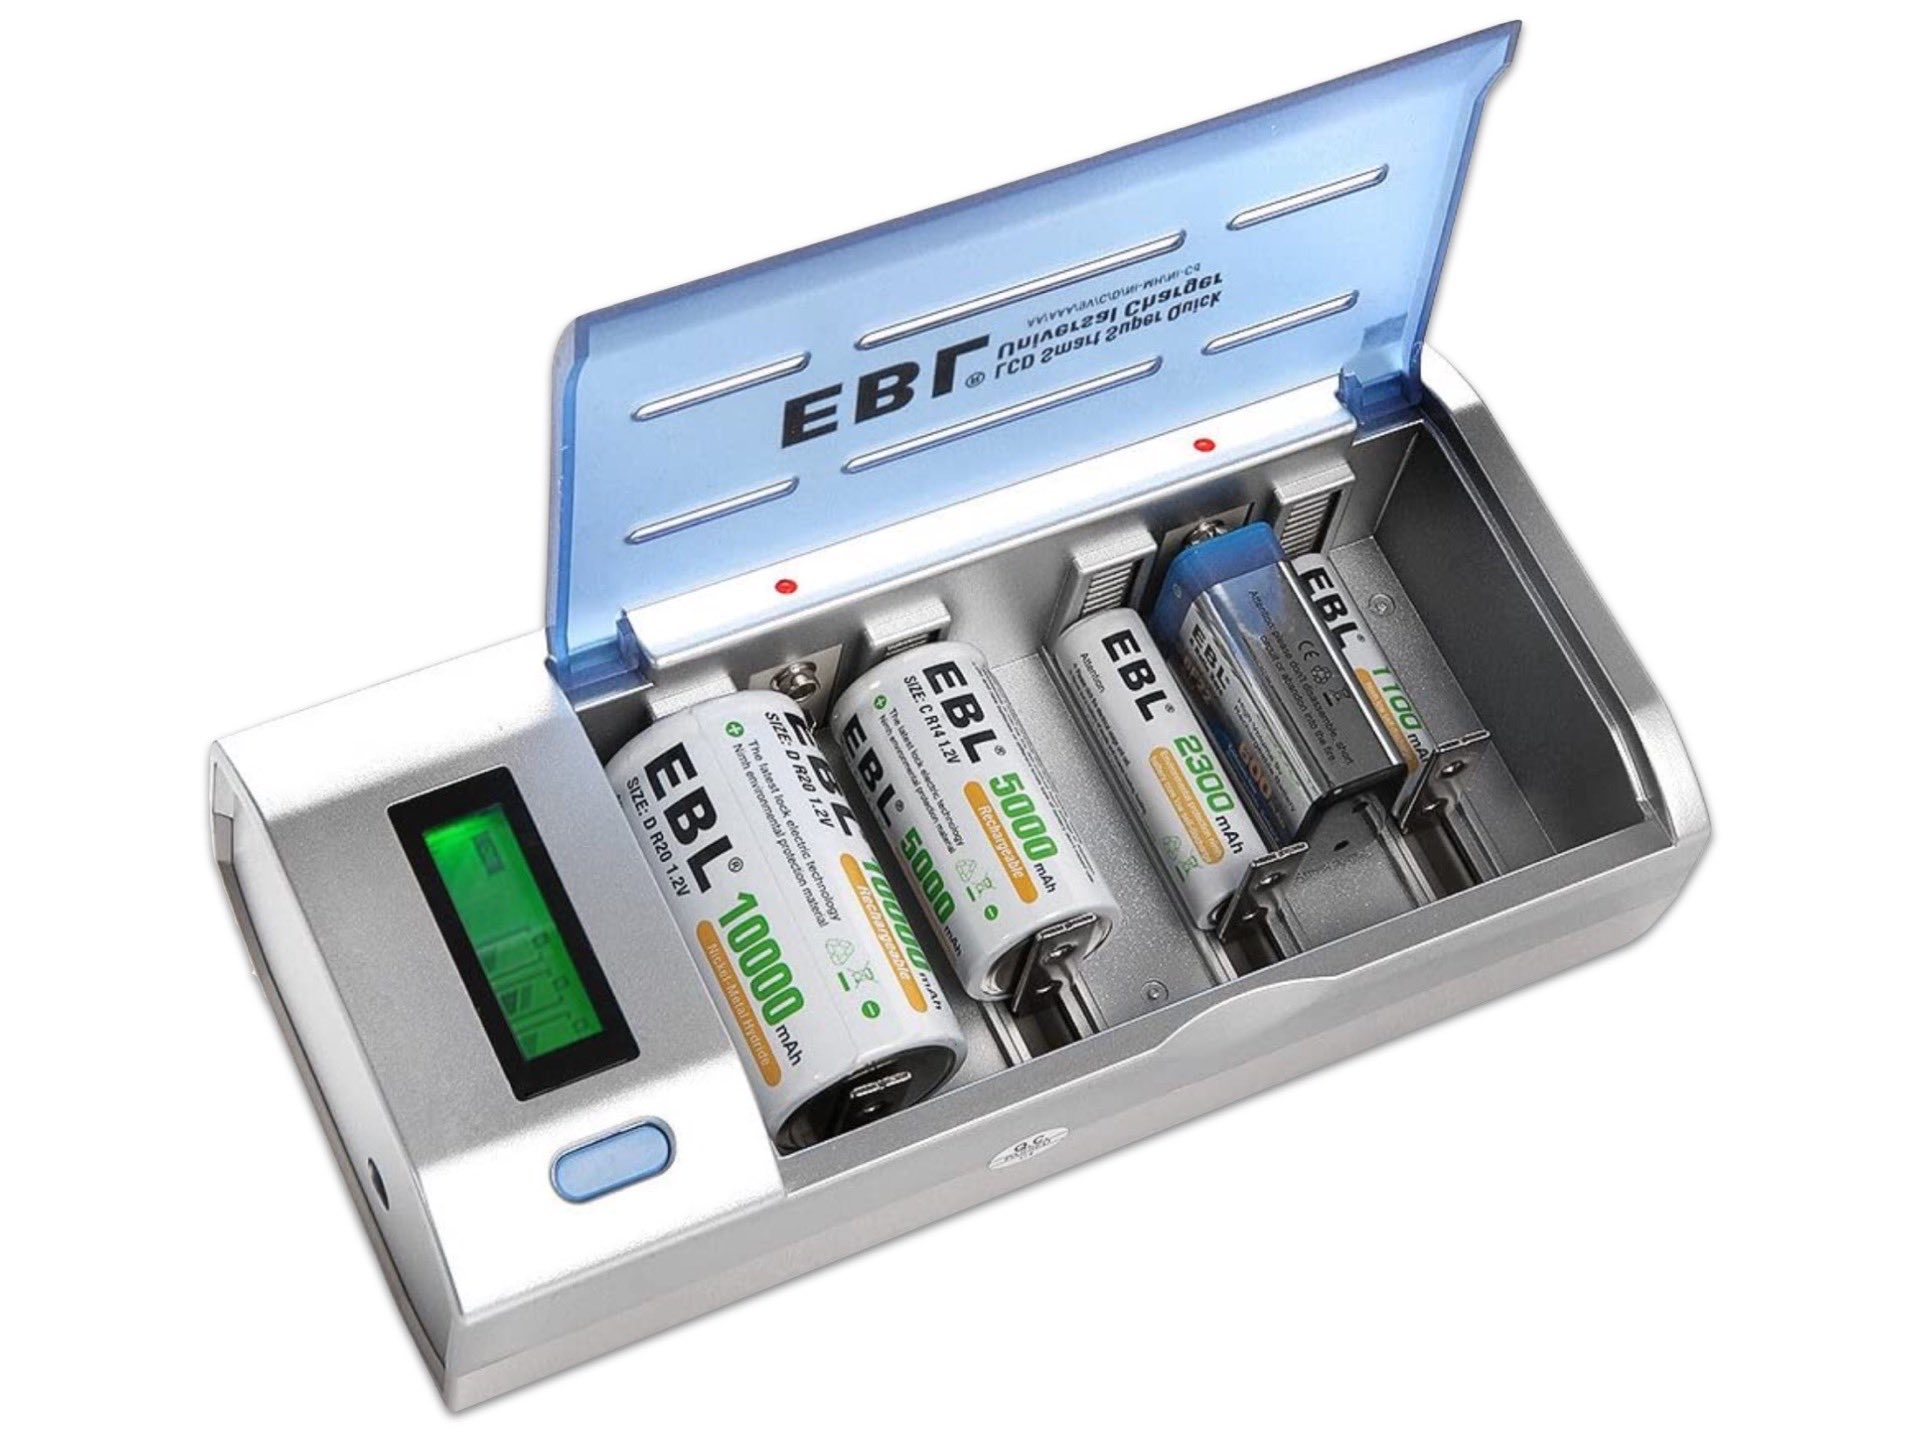 ebl-universal-smart-battery-charger